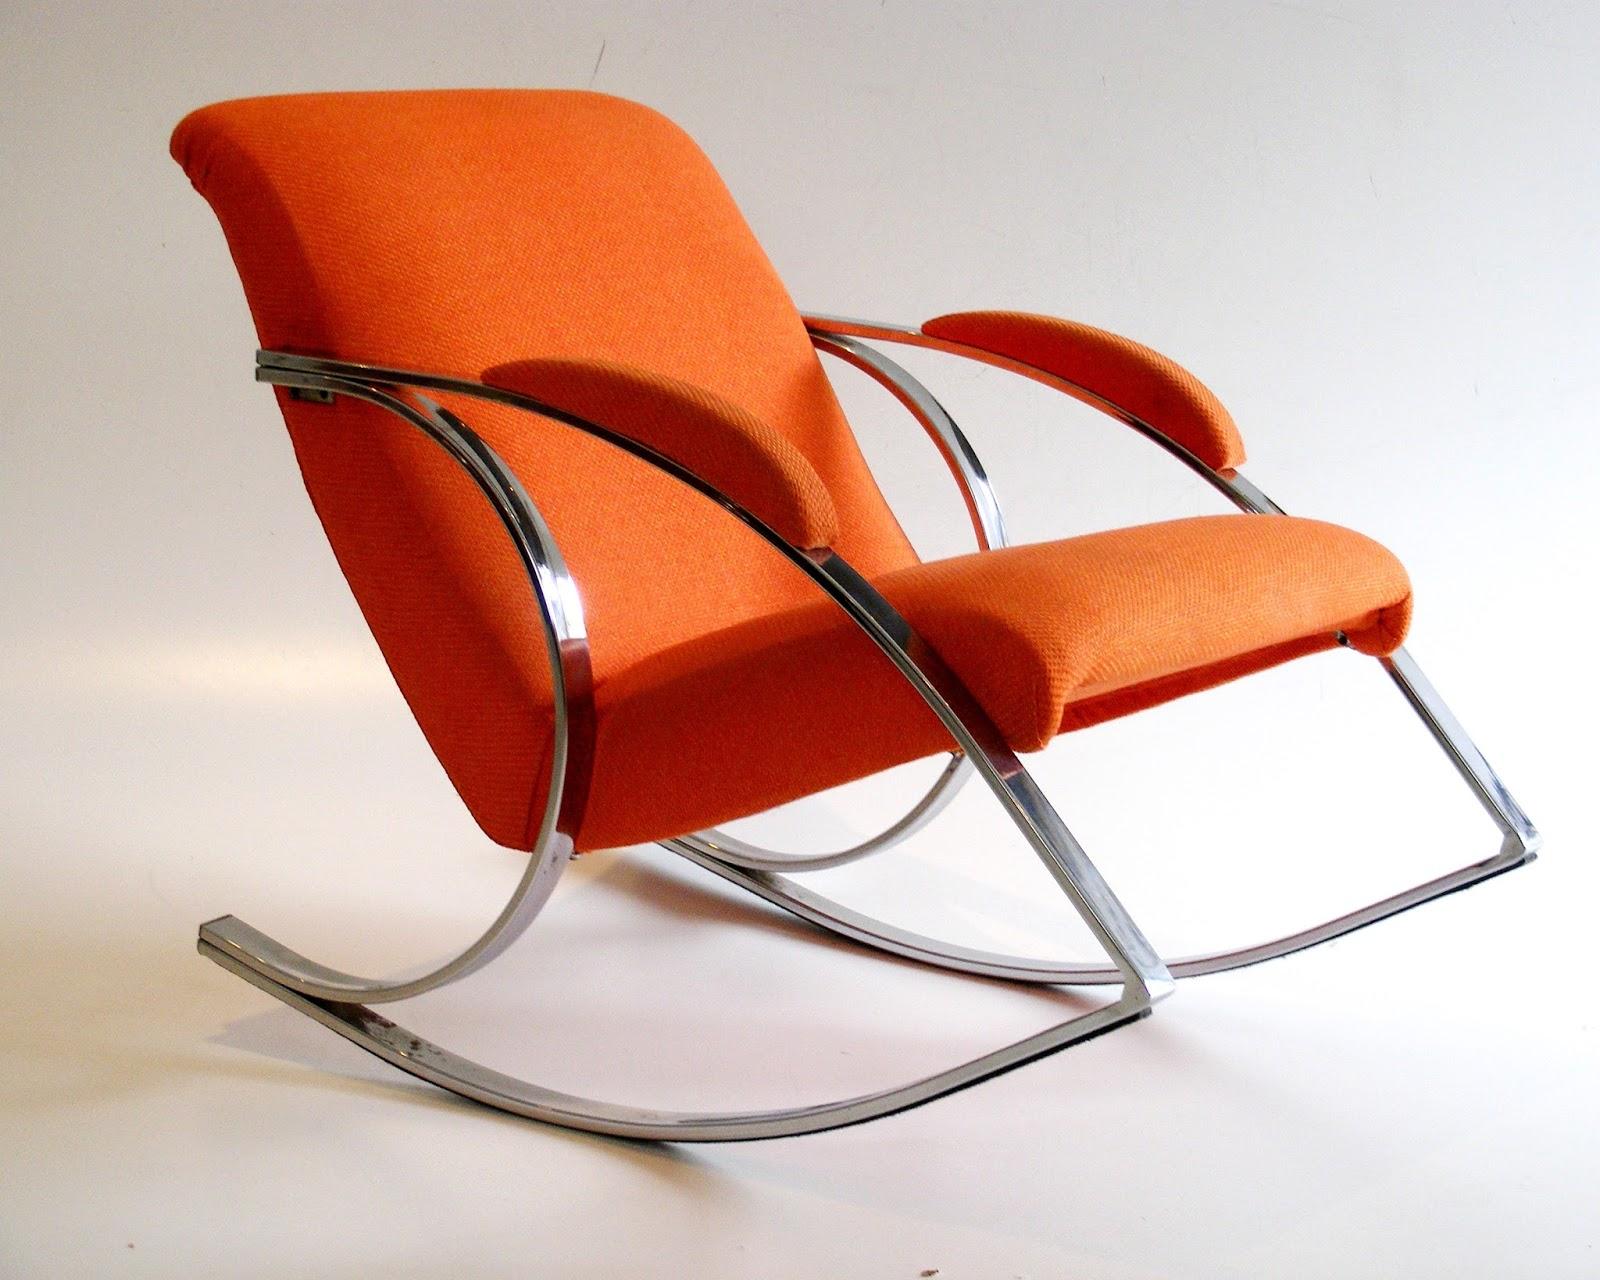 finest selection 69aef 30a45 VAMP FURNITURE: Vintage chrome rocking chair_15 December 2017